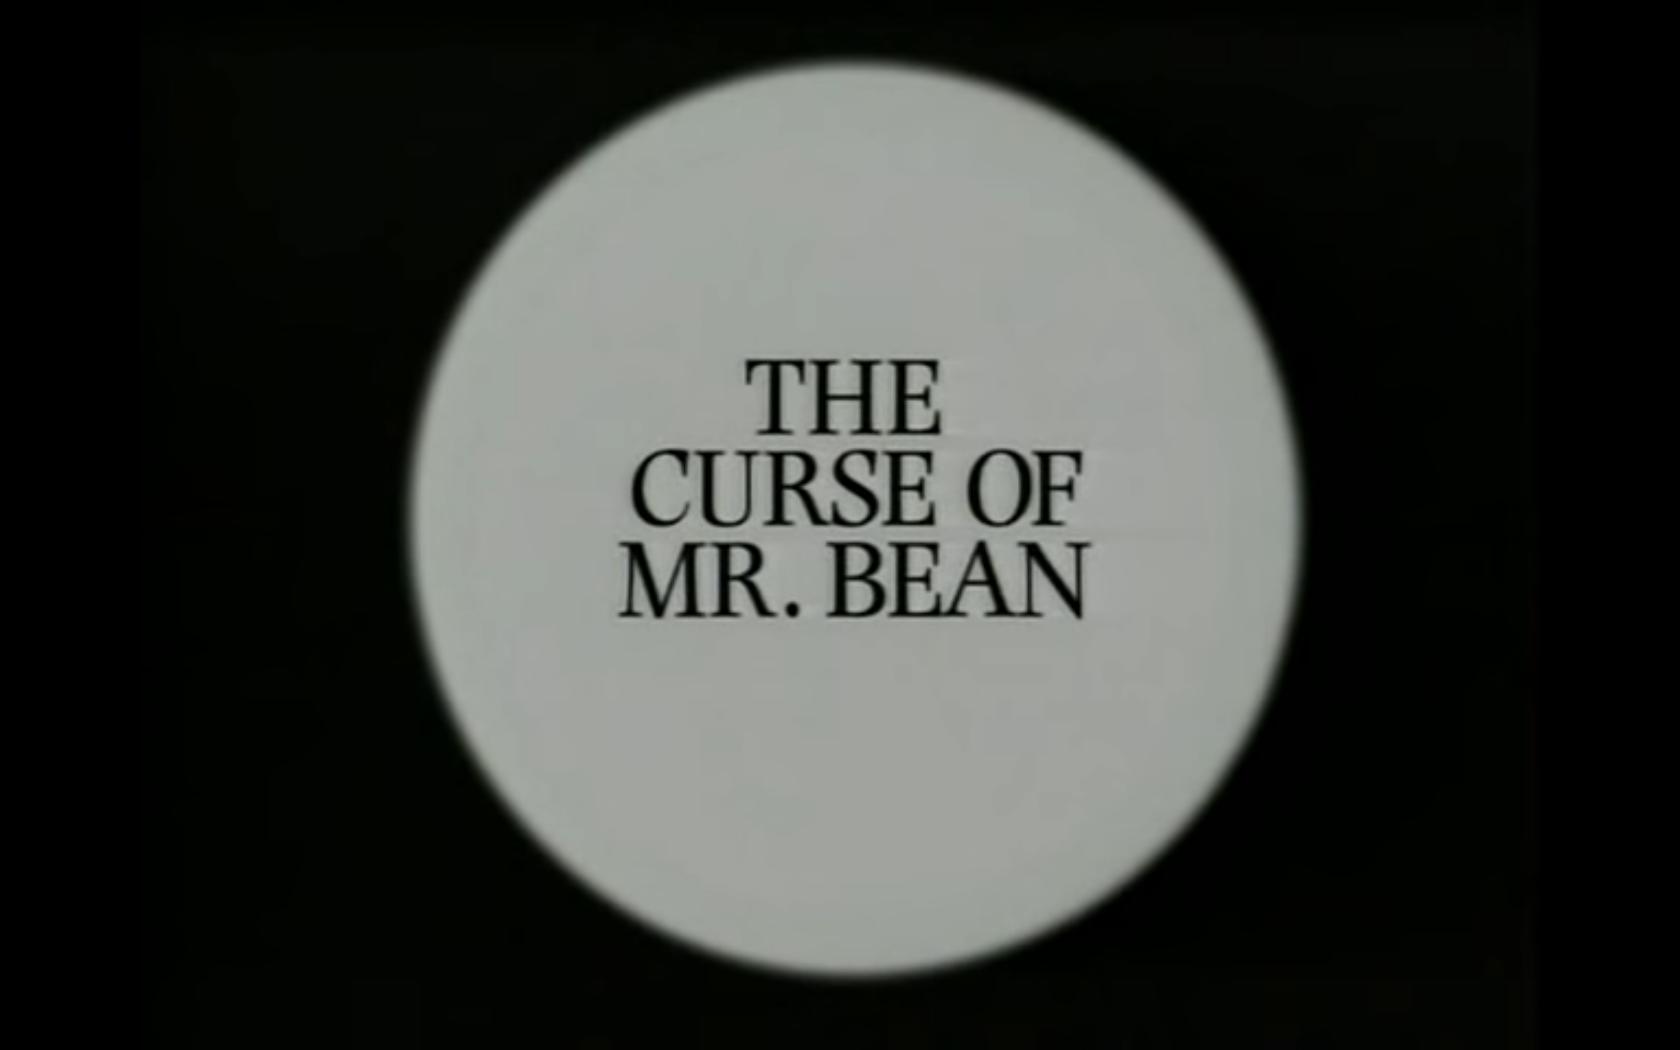 The curse of mr bean mr bean wiki fandom powered by wikia the curse of mr bean solutioingenieria Gallery